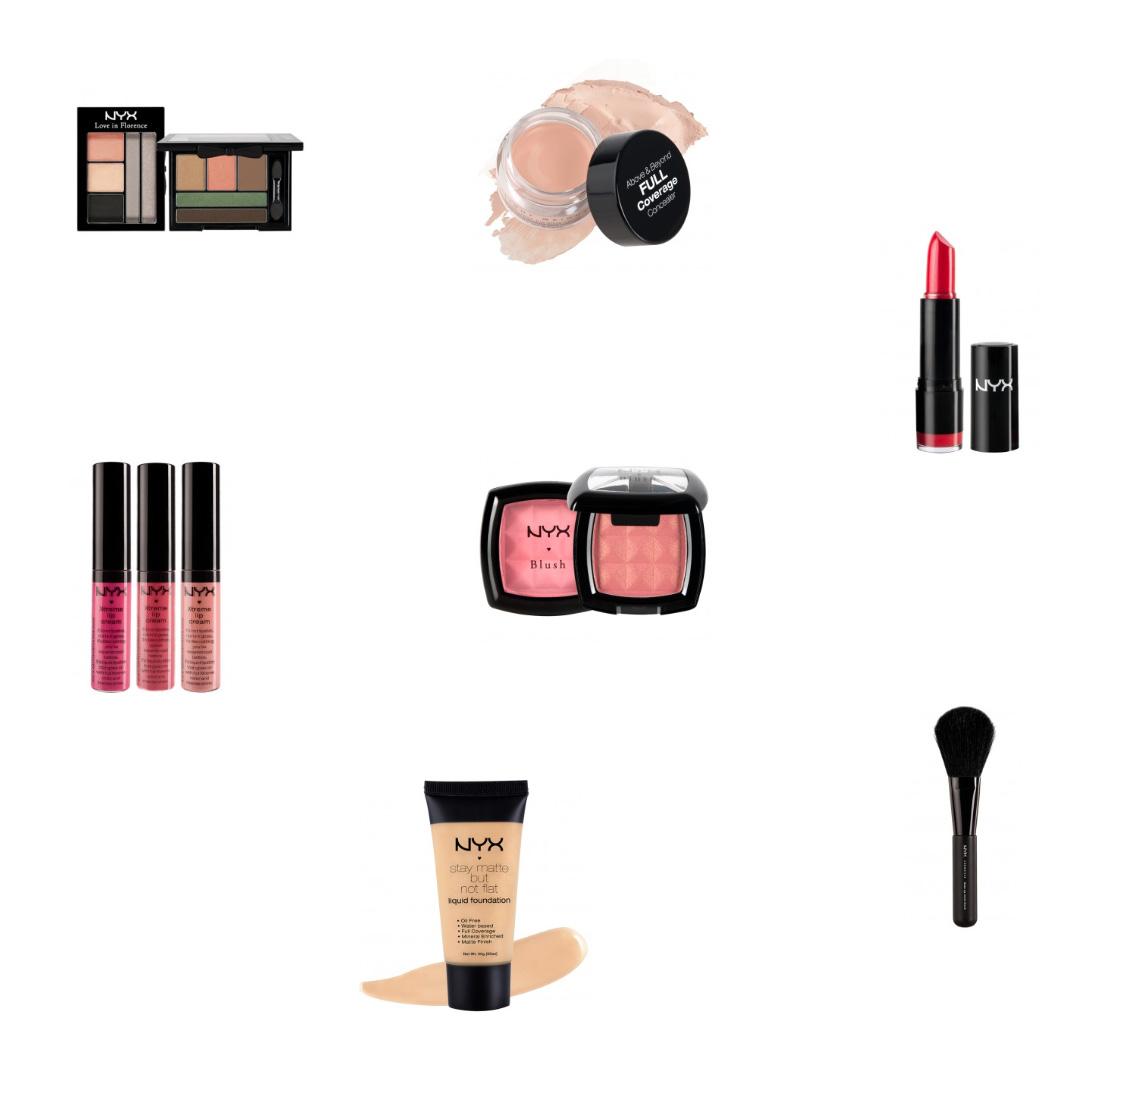 maquillage-nyxcosmetics